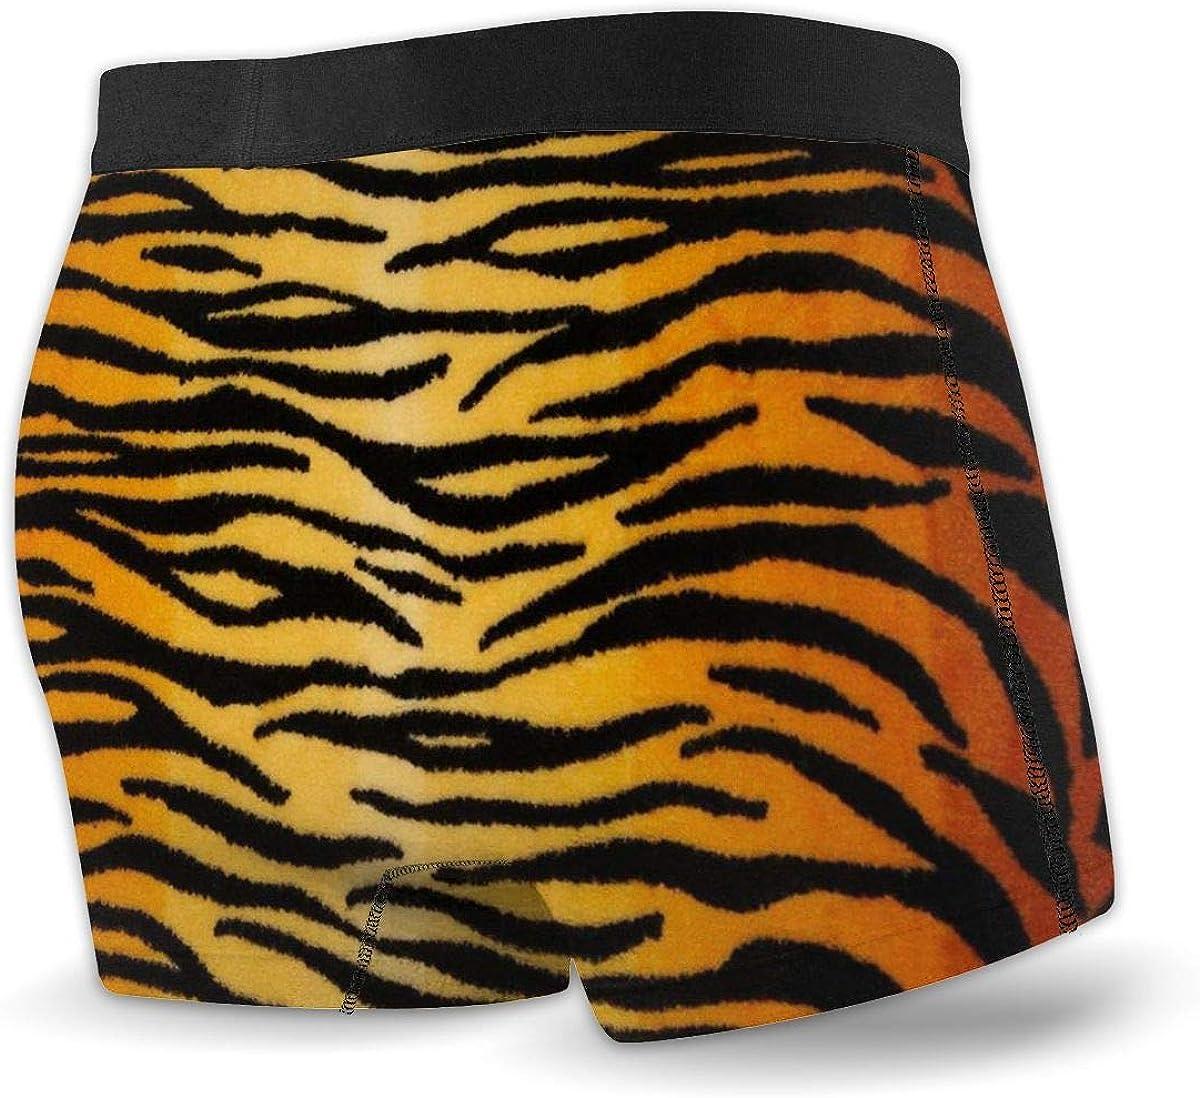 Cool Mens Leopard Print Underwear Boxer Trunks Briefs G-string Shorts Underpants